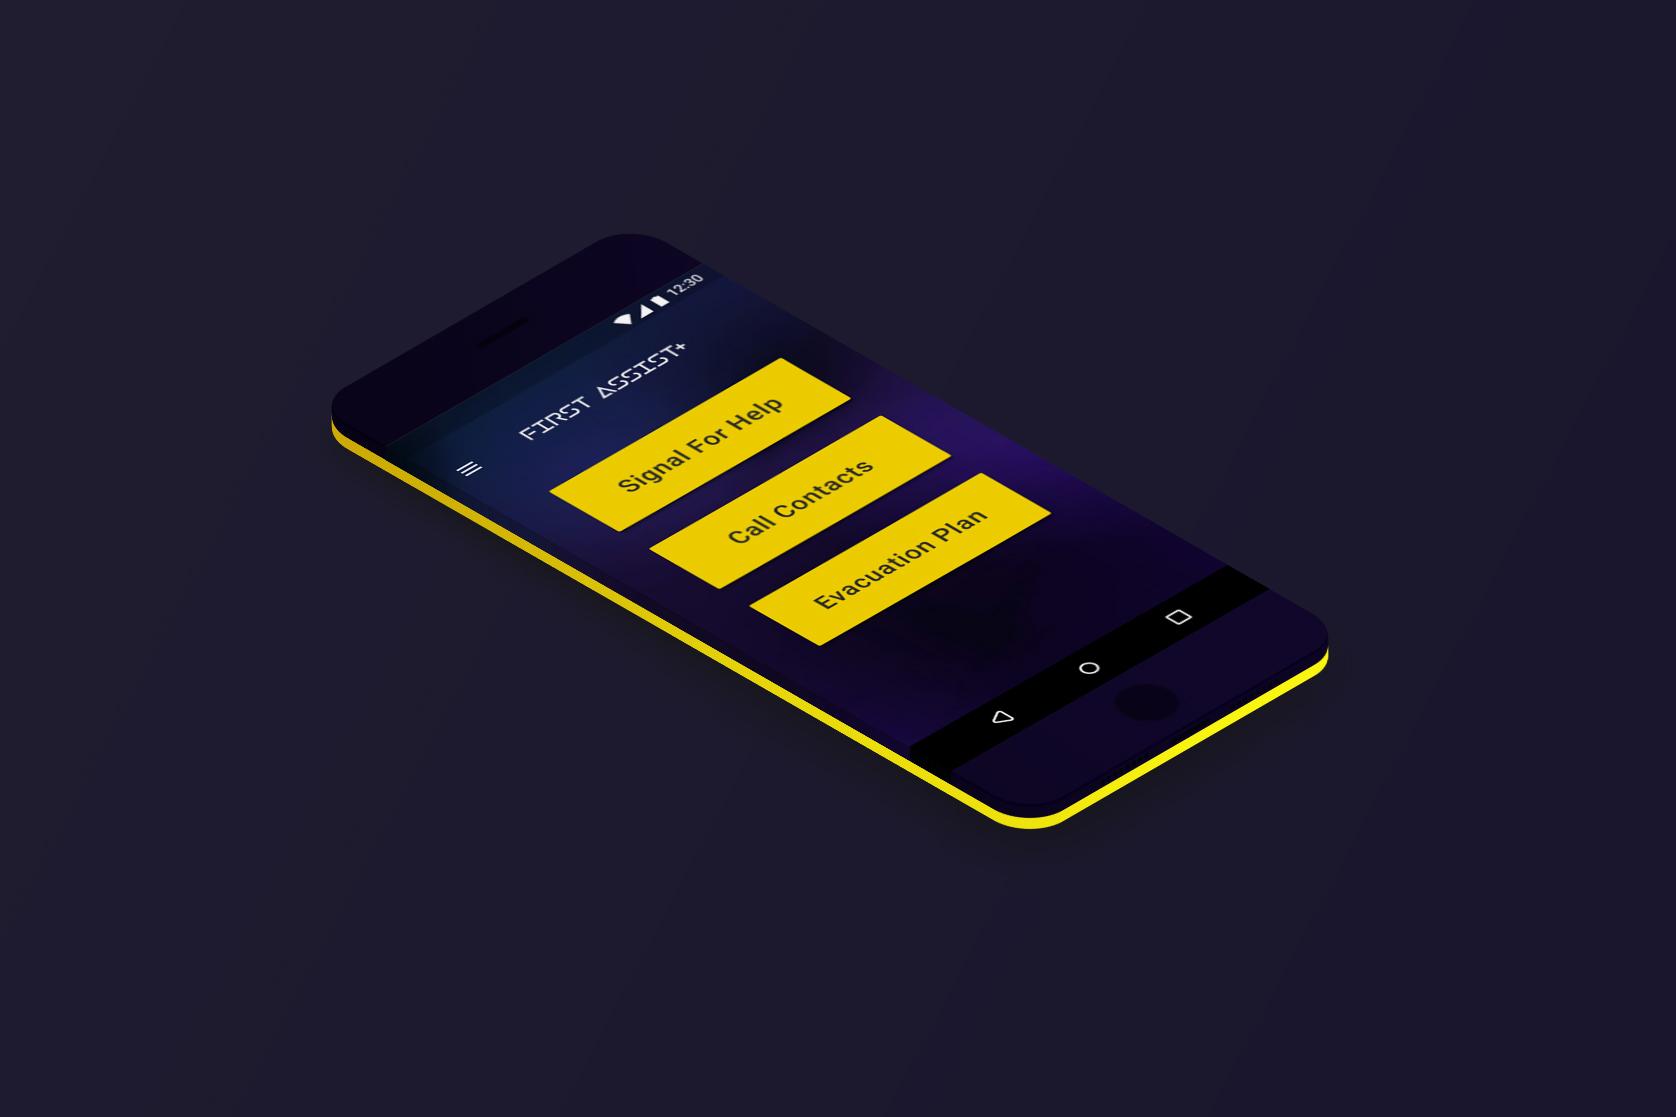 Phone-03-withCase-Dark-Style.jpg